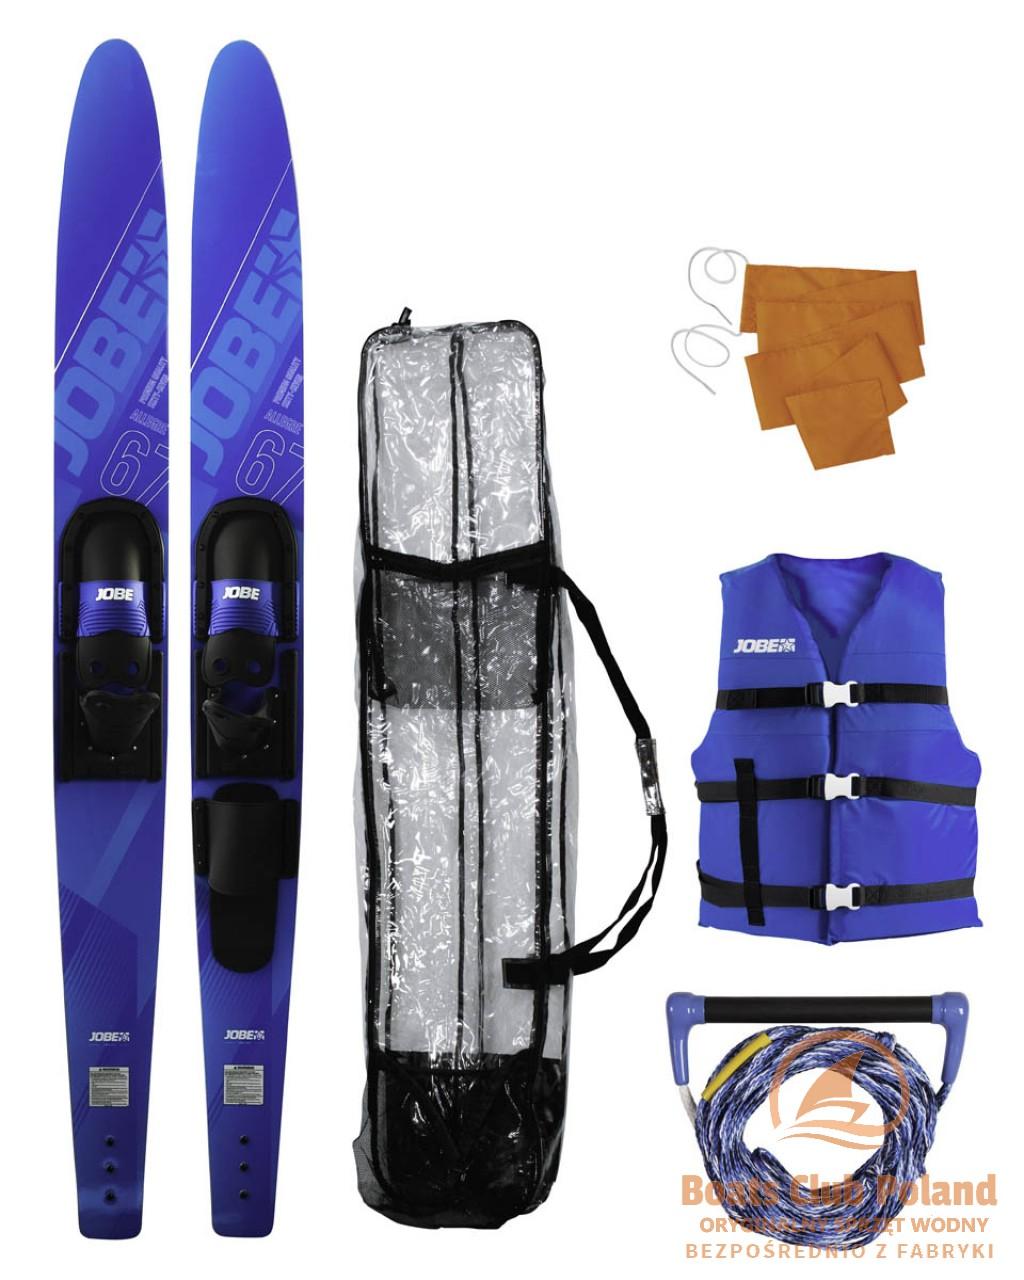 narty-wodne-jobe-allegre-67-combo-skis-blue-package